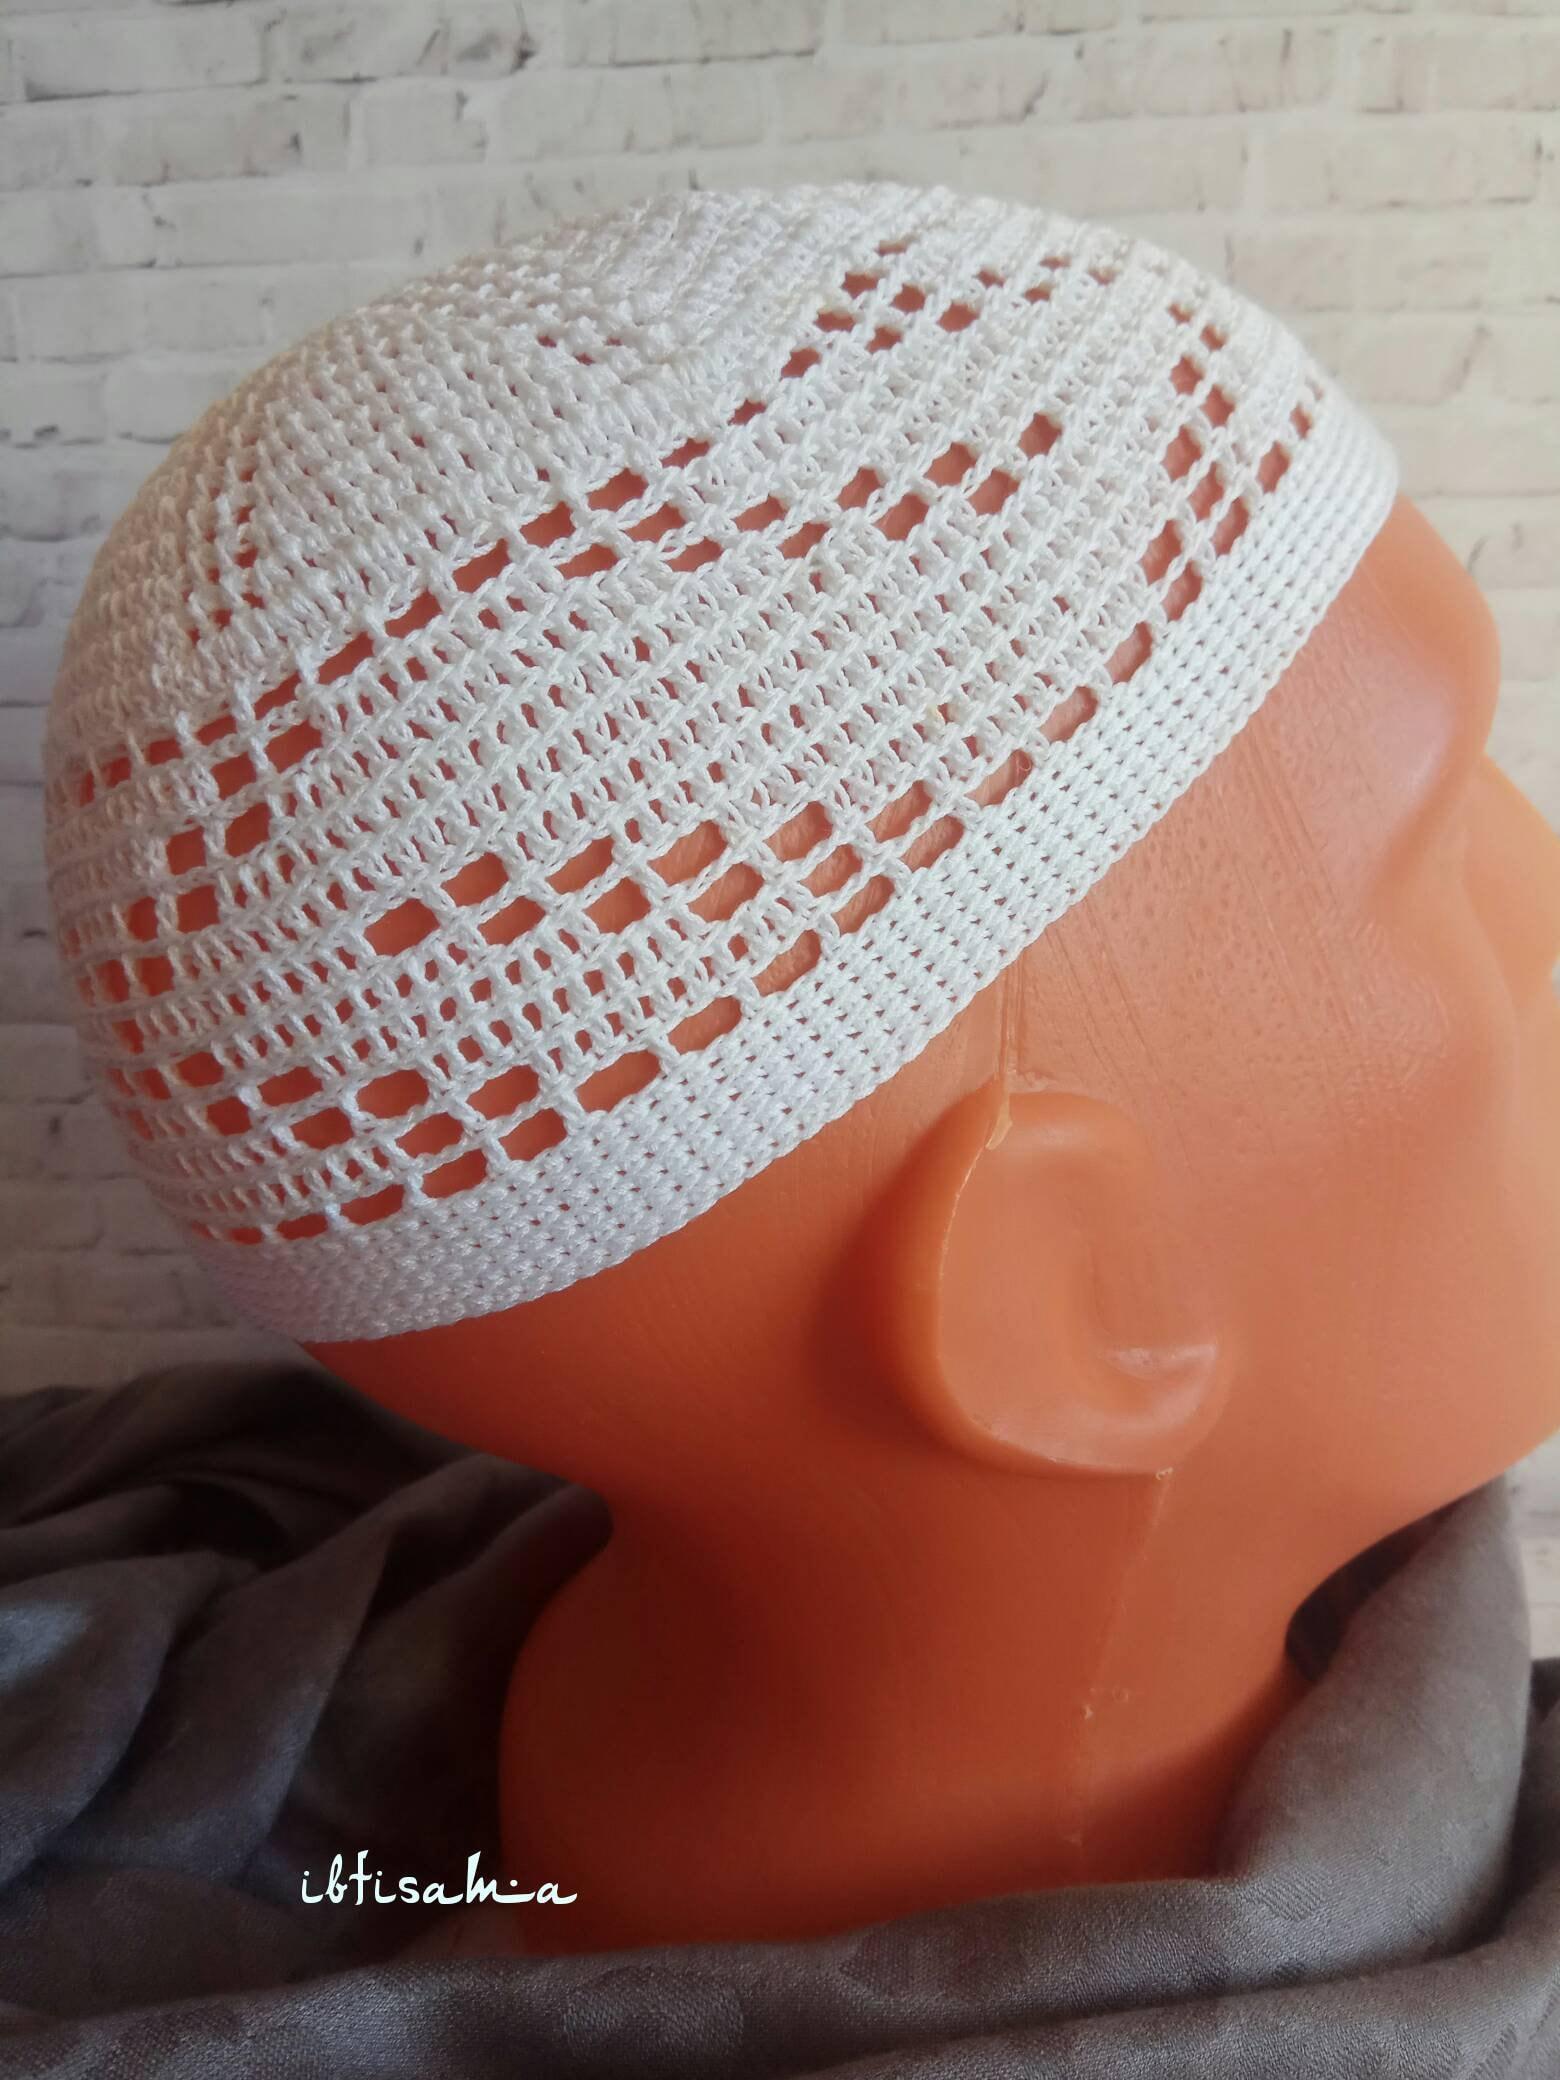 0dbe2d7dfa8 Muslim hat cotton skull cap kufi hat men beanie crochet kufi etsy jpg  1560x2080 Muslim hats